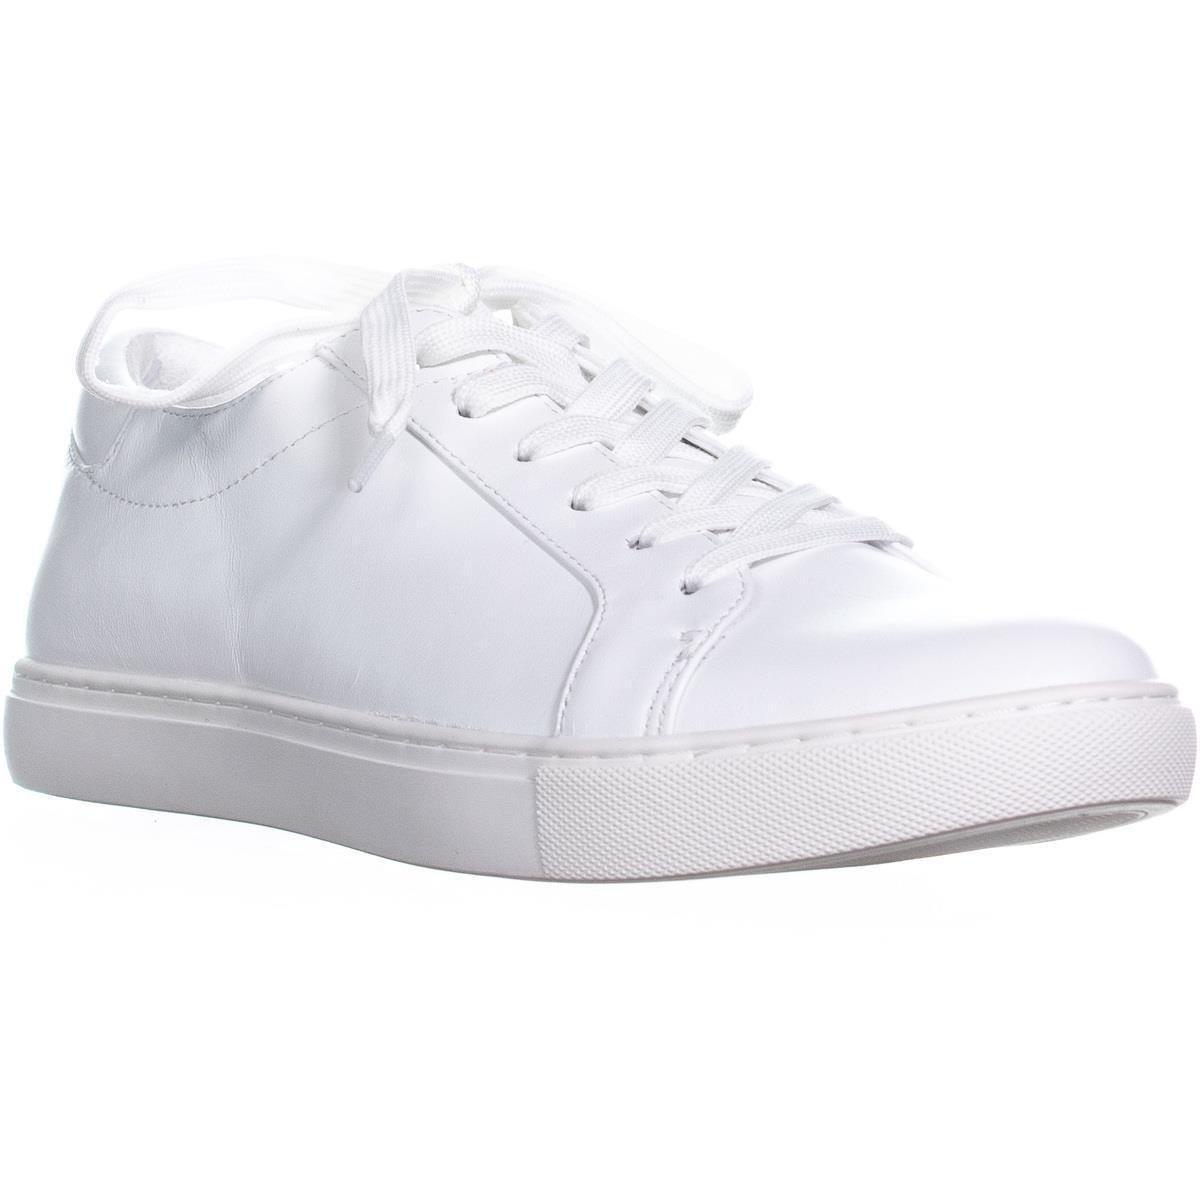 Kenneth Cole Women's Kam Pride Sneaker B071XY767S 6.5 B(M) US|White